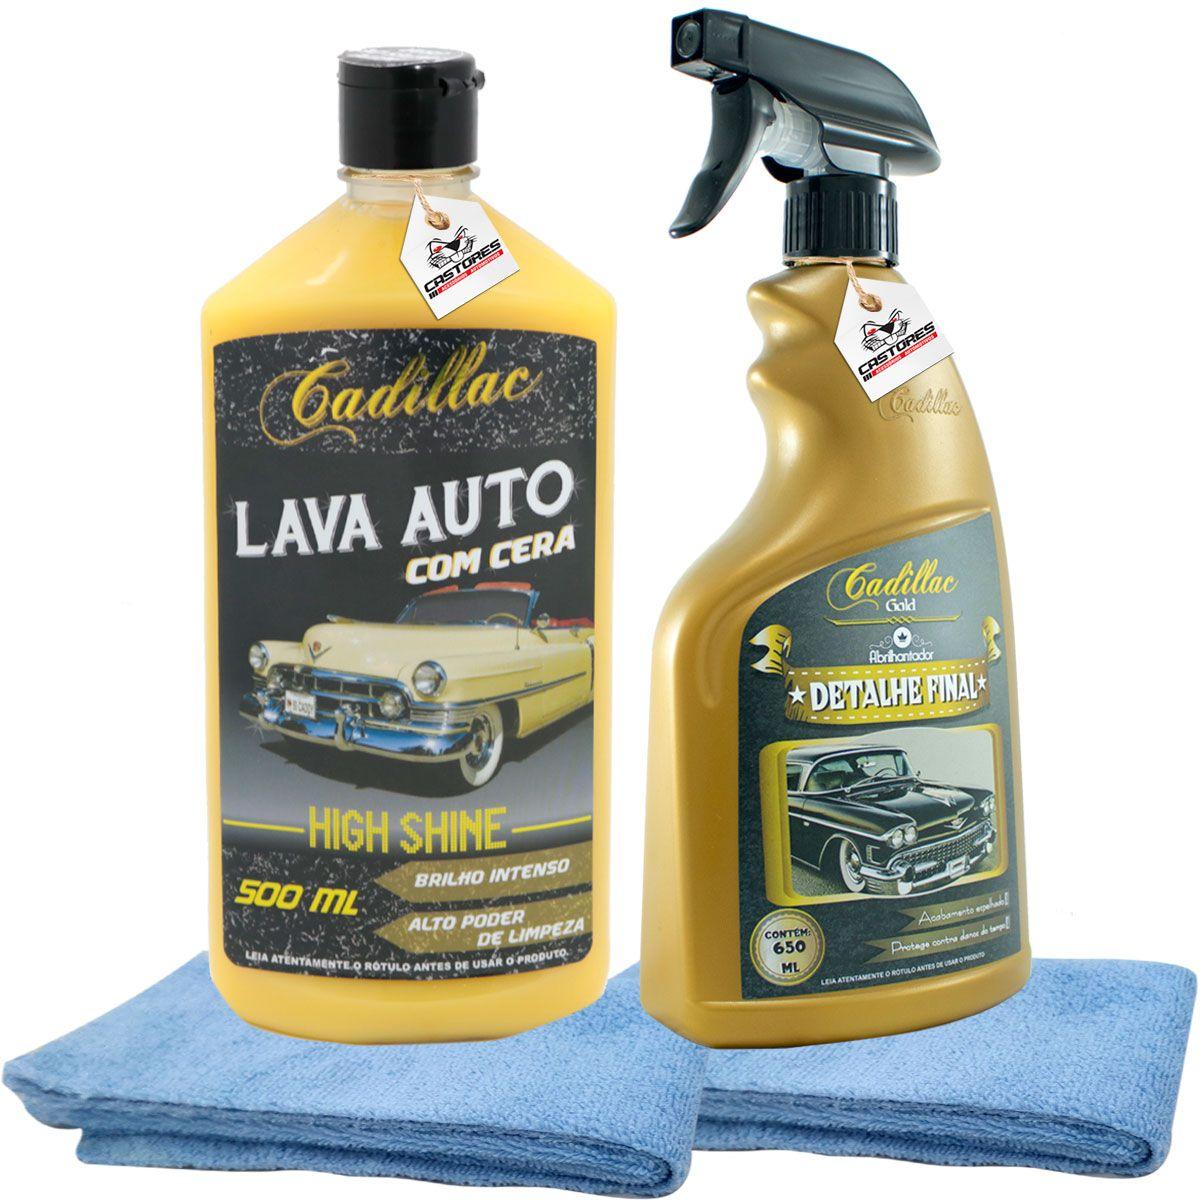 Kit Lavagem Shampoo Com Cera Cadillac + Detalhe Final + 2x Microfibra